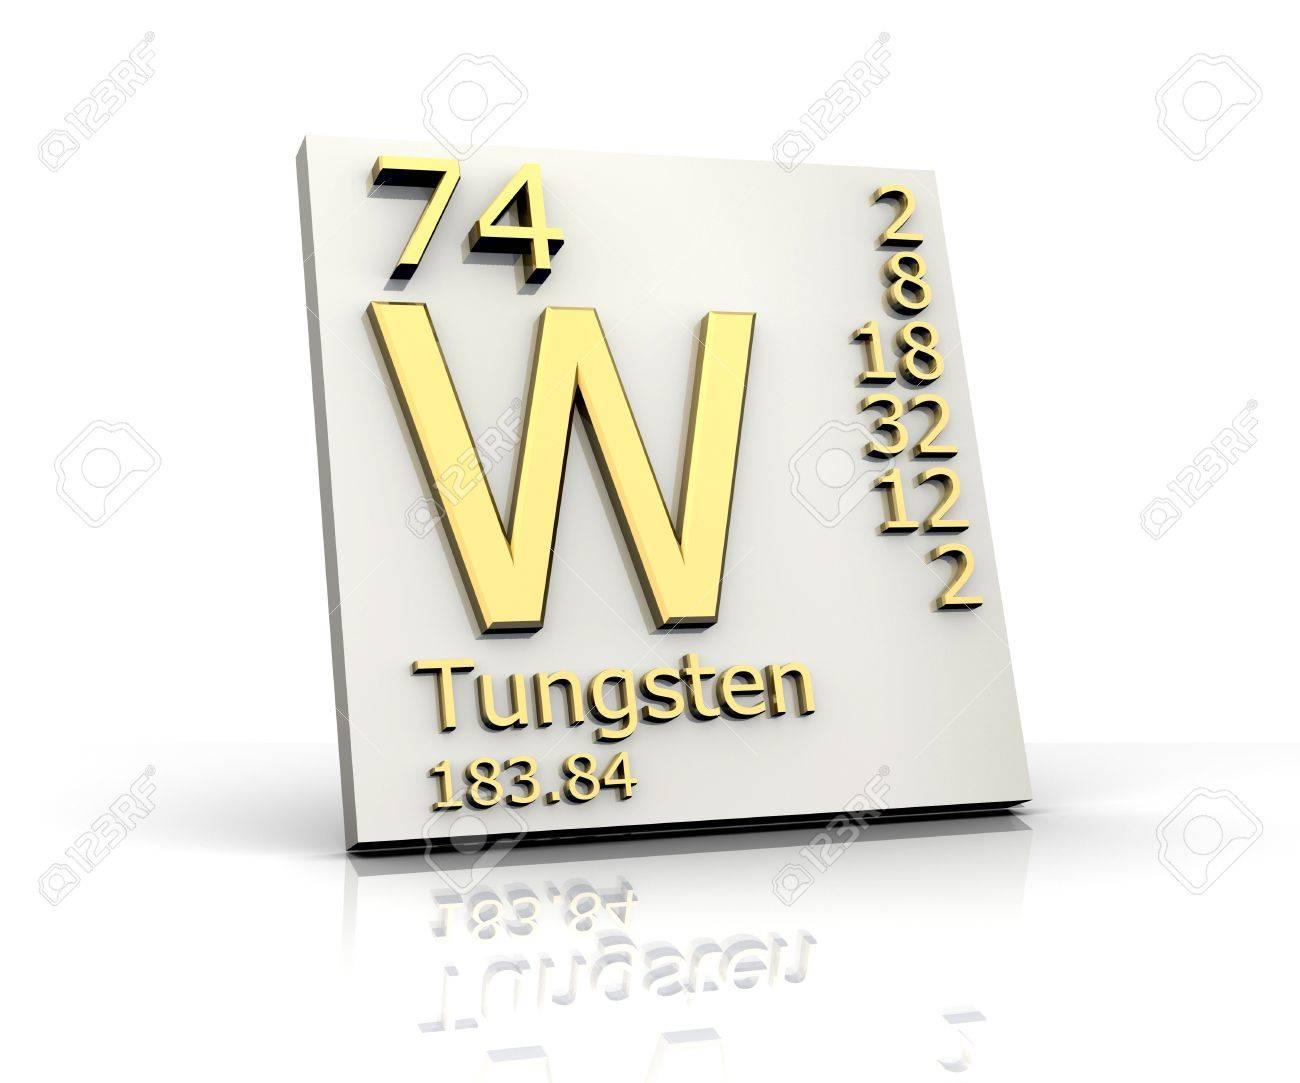 Tungsten on periodic table gallery periodic table images tungsten form periodic table of elements stock photo picture and tungsten form periodic table of elements gamestrikefo Gallery